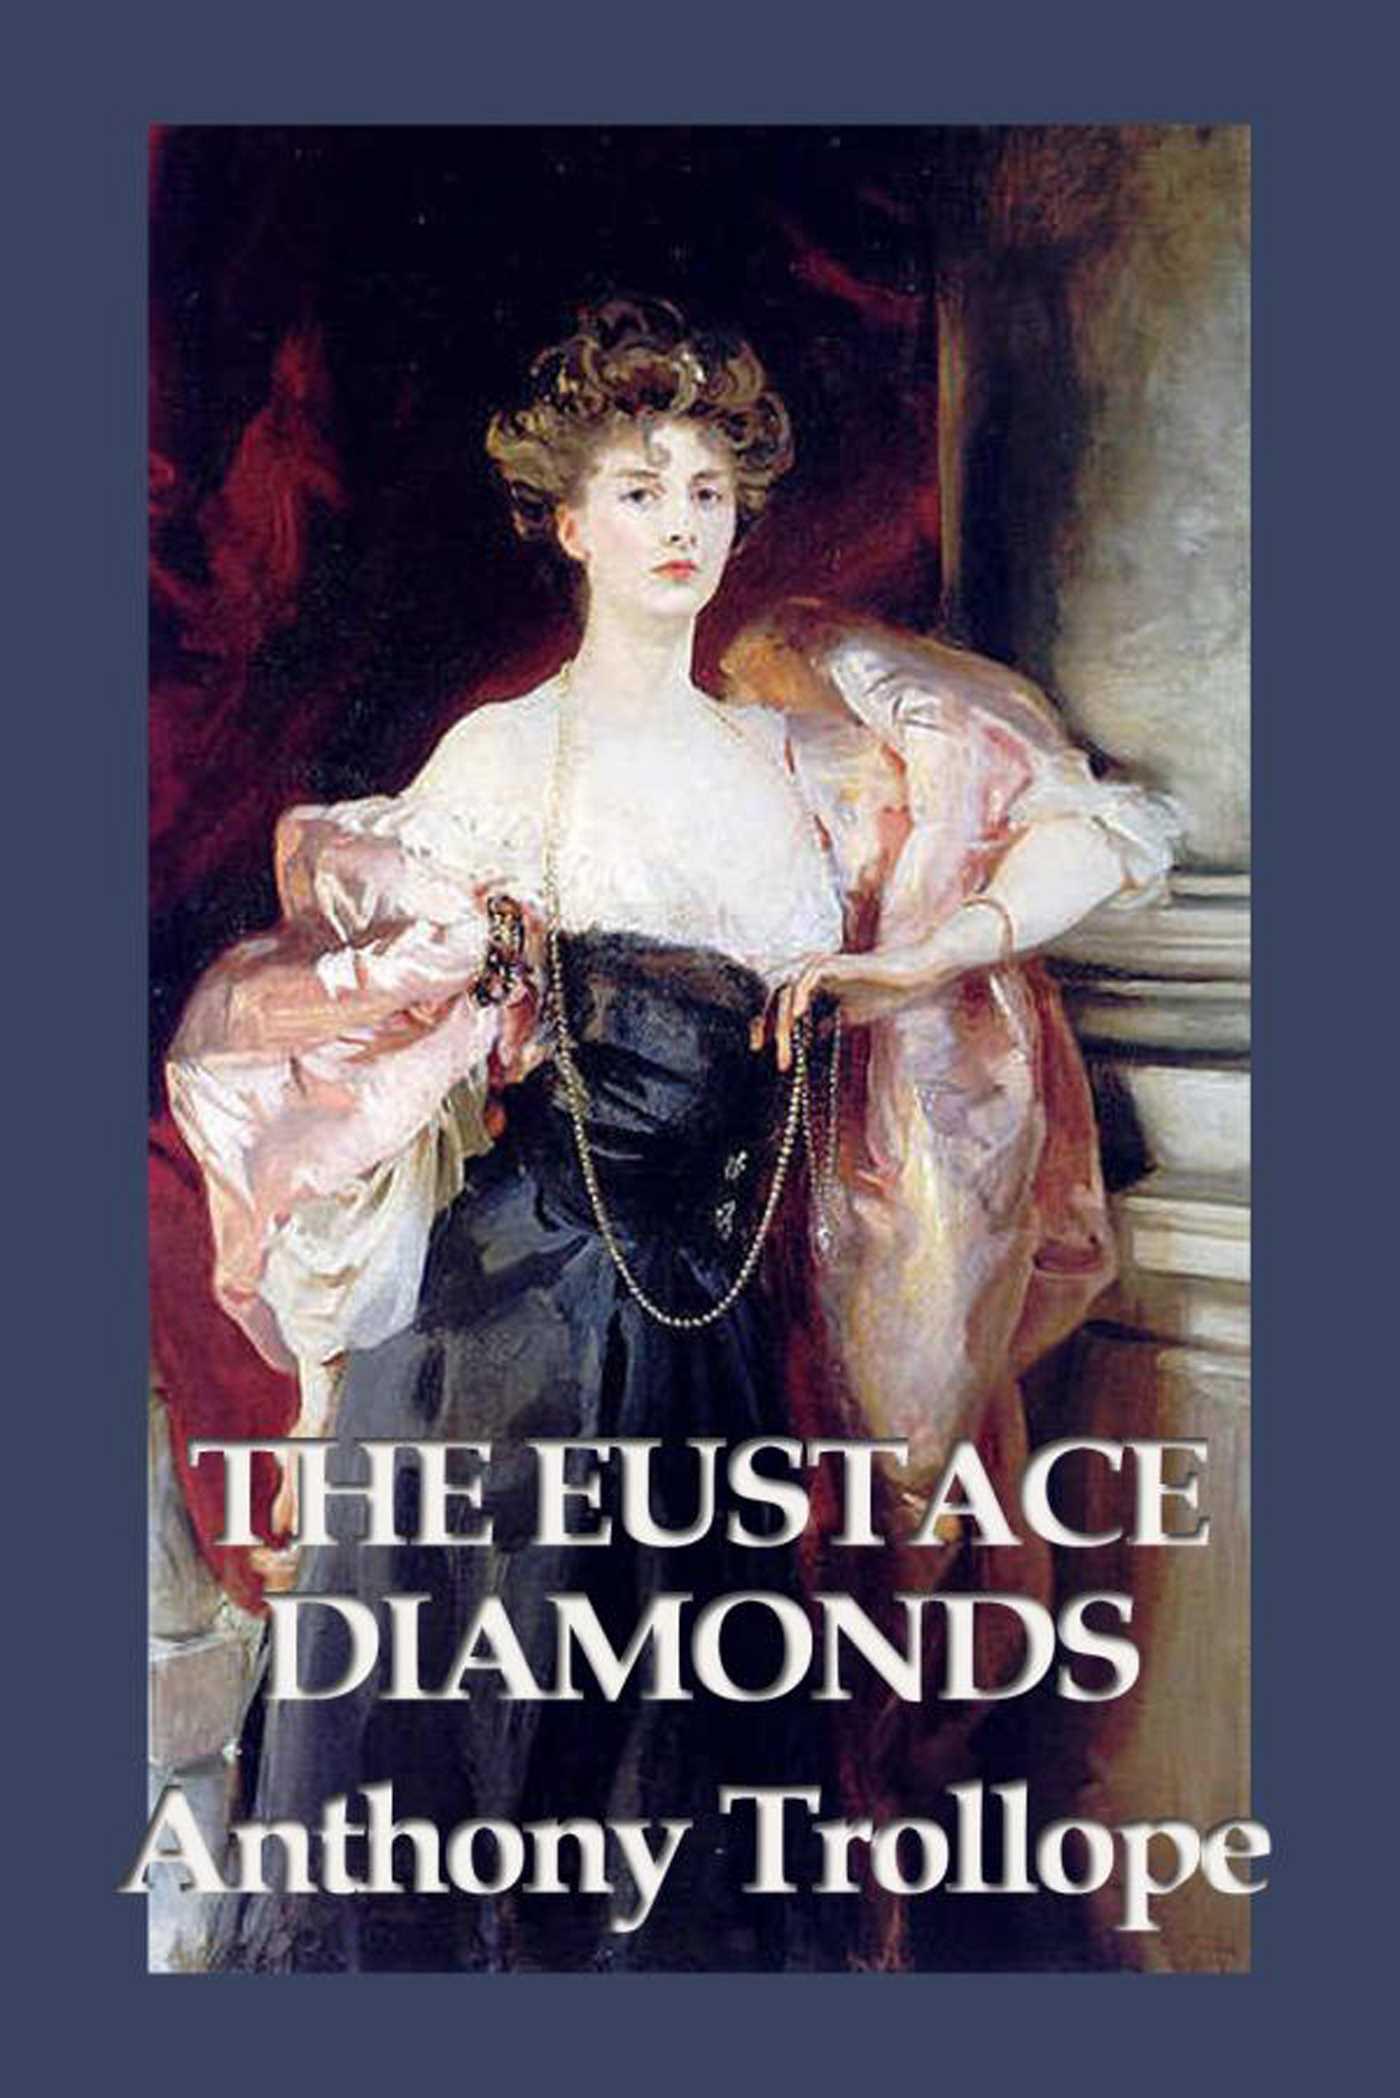 Anthony Trollope - The Eustace Diamonds